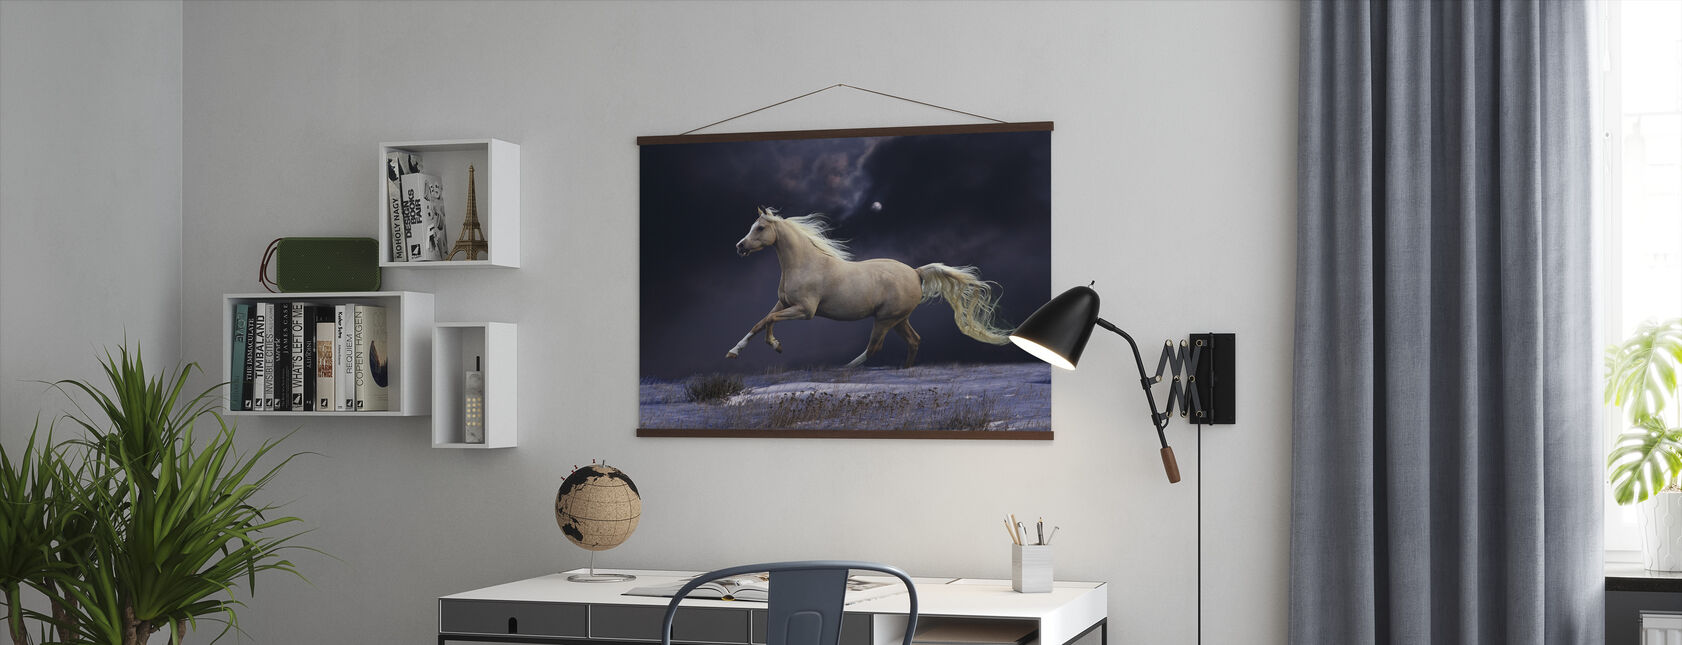 Horse in Moonlight - Poster - Office